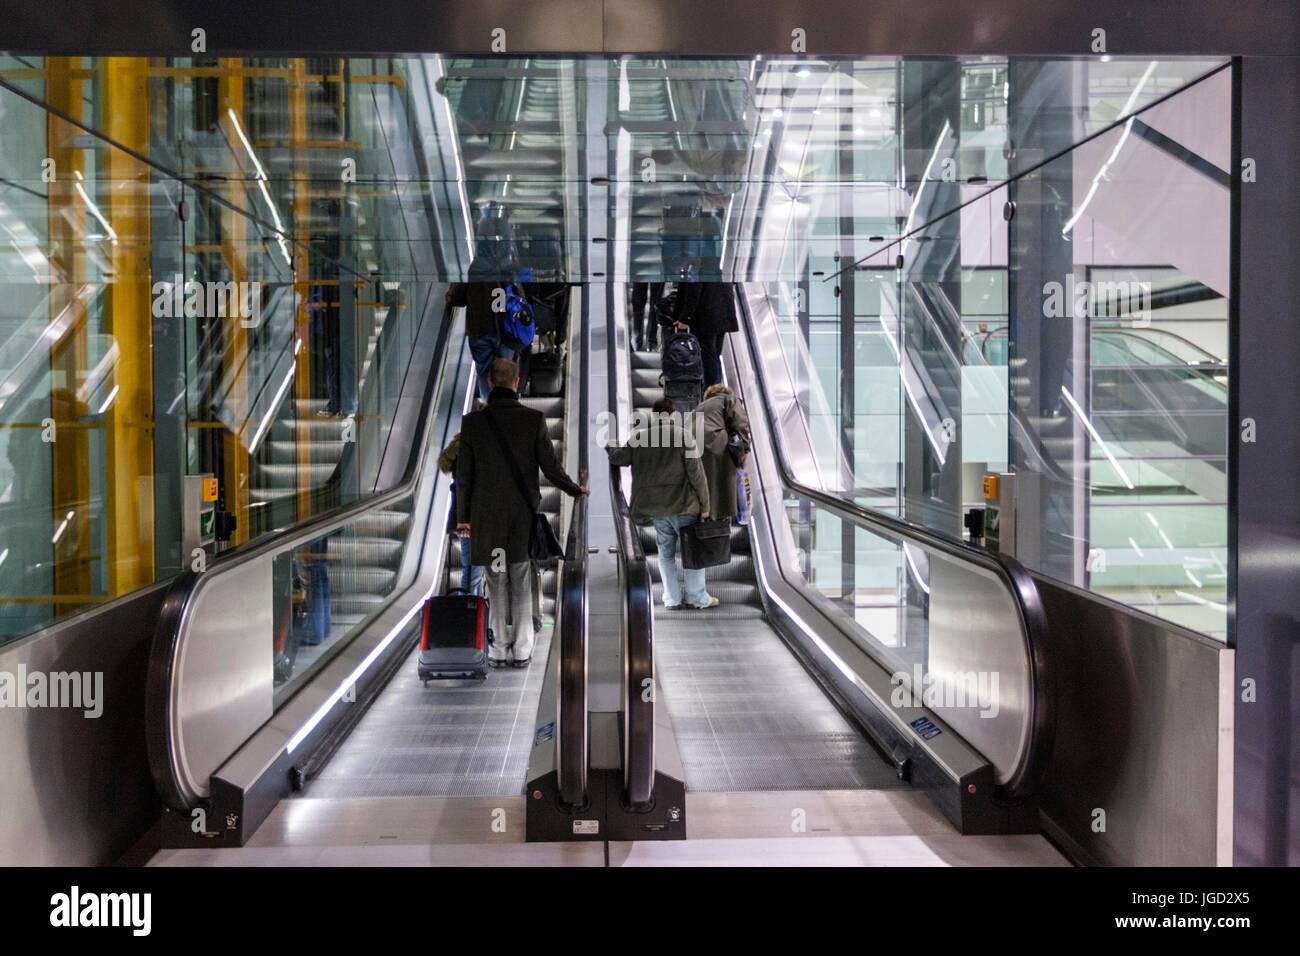 T5 Heathrow Airport escalators,  by architects Richard Rogers Partnership  England, UK - Stock Image